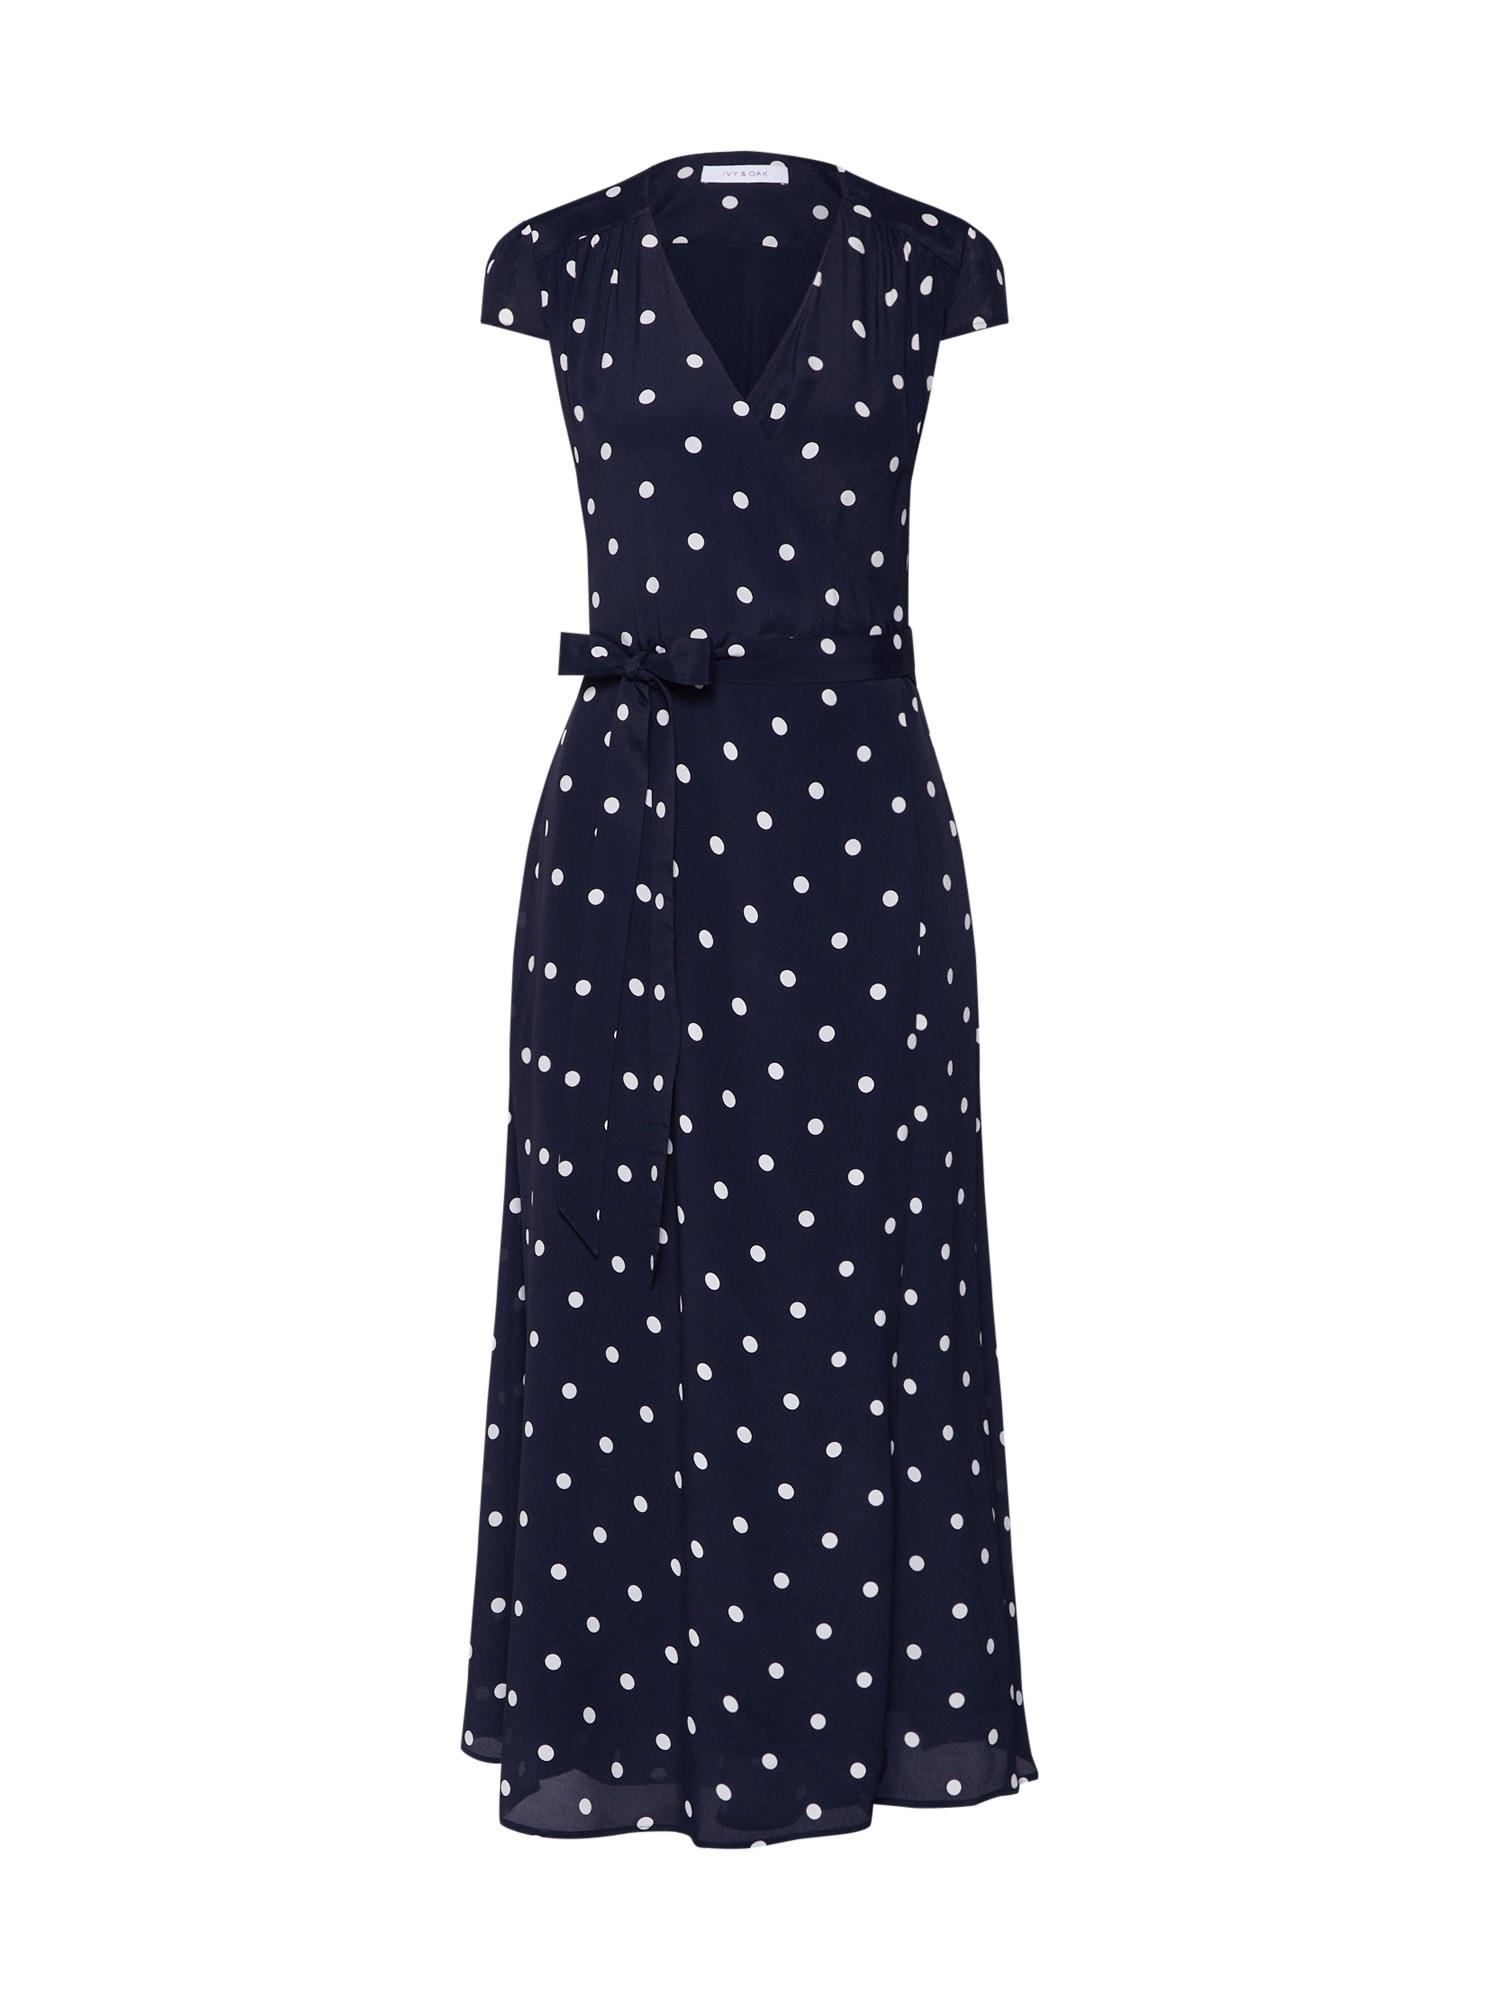 Šaty Polka Dot Wrap Dress Midi noční modrá bílá IVY & OAK